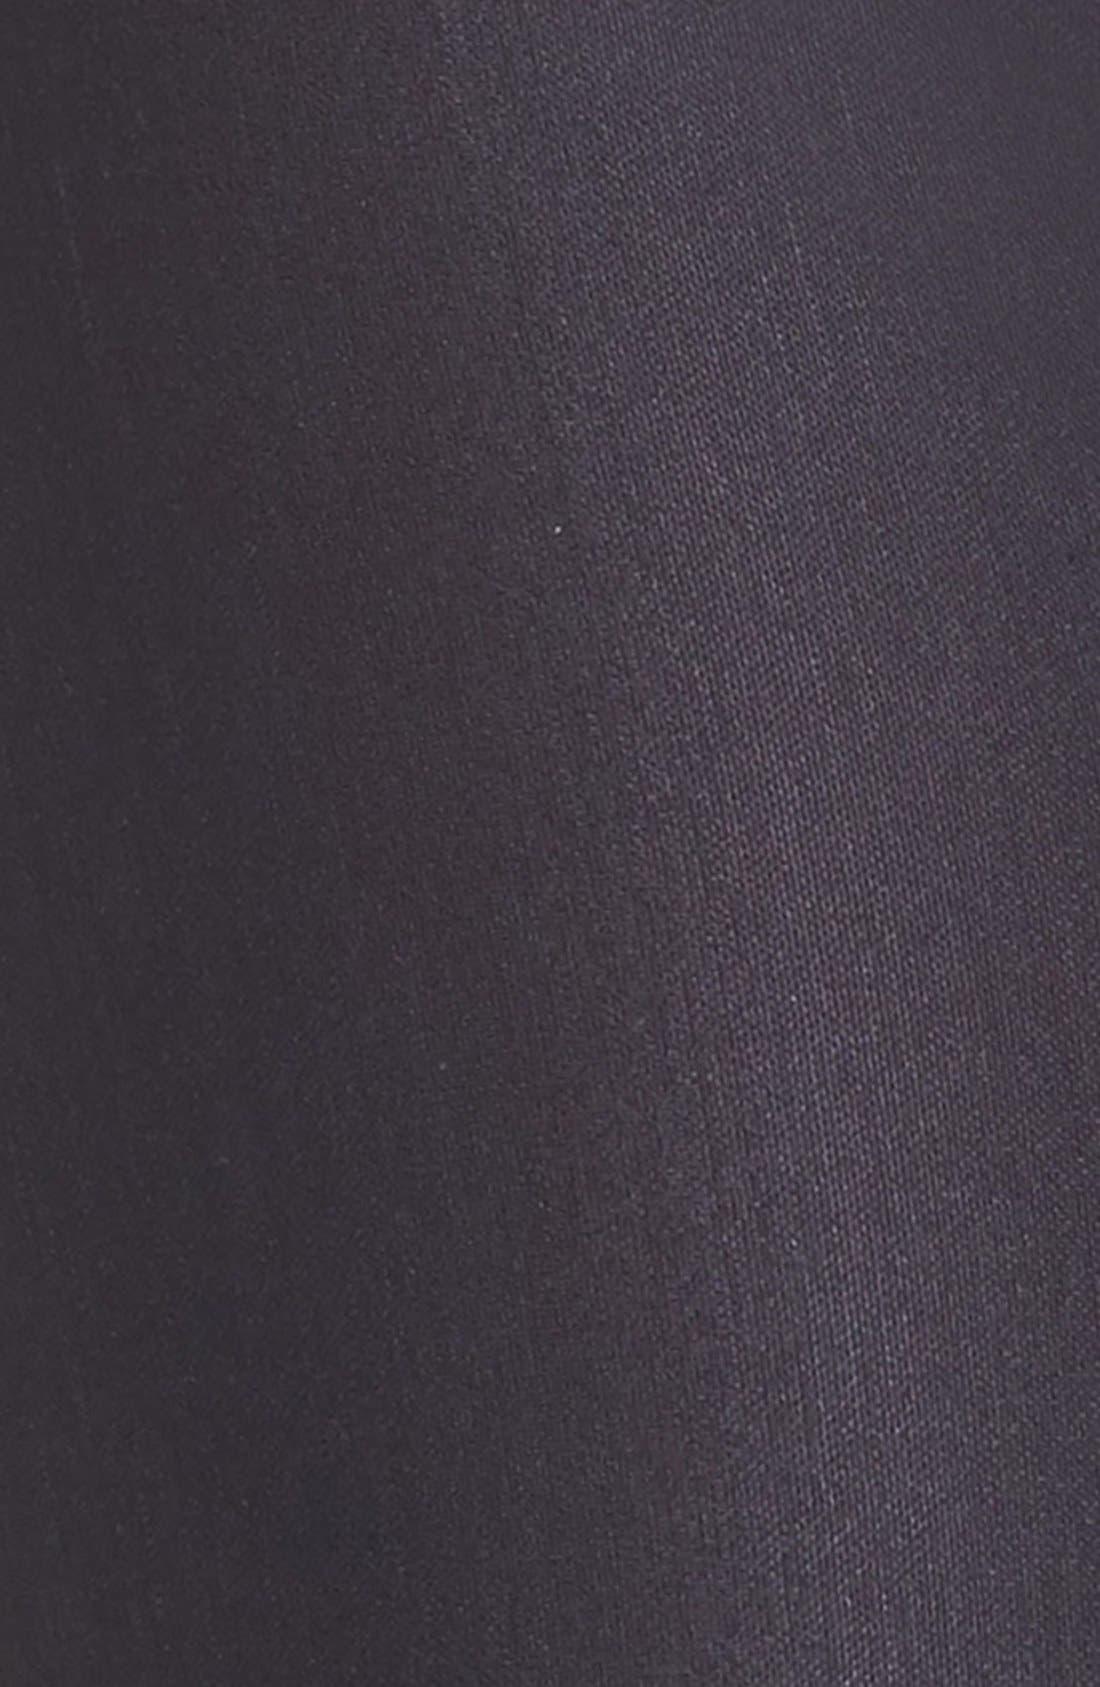 Body Base Smoothing Shorts,                             Alternate thumbnail 4, color,                             Black